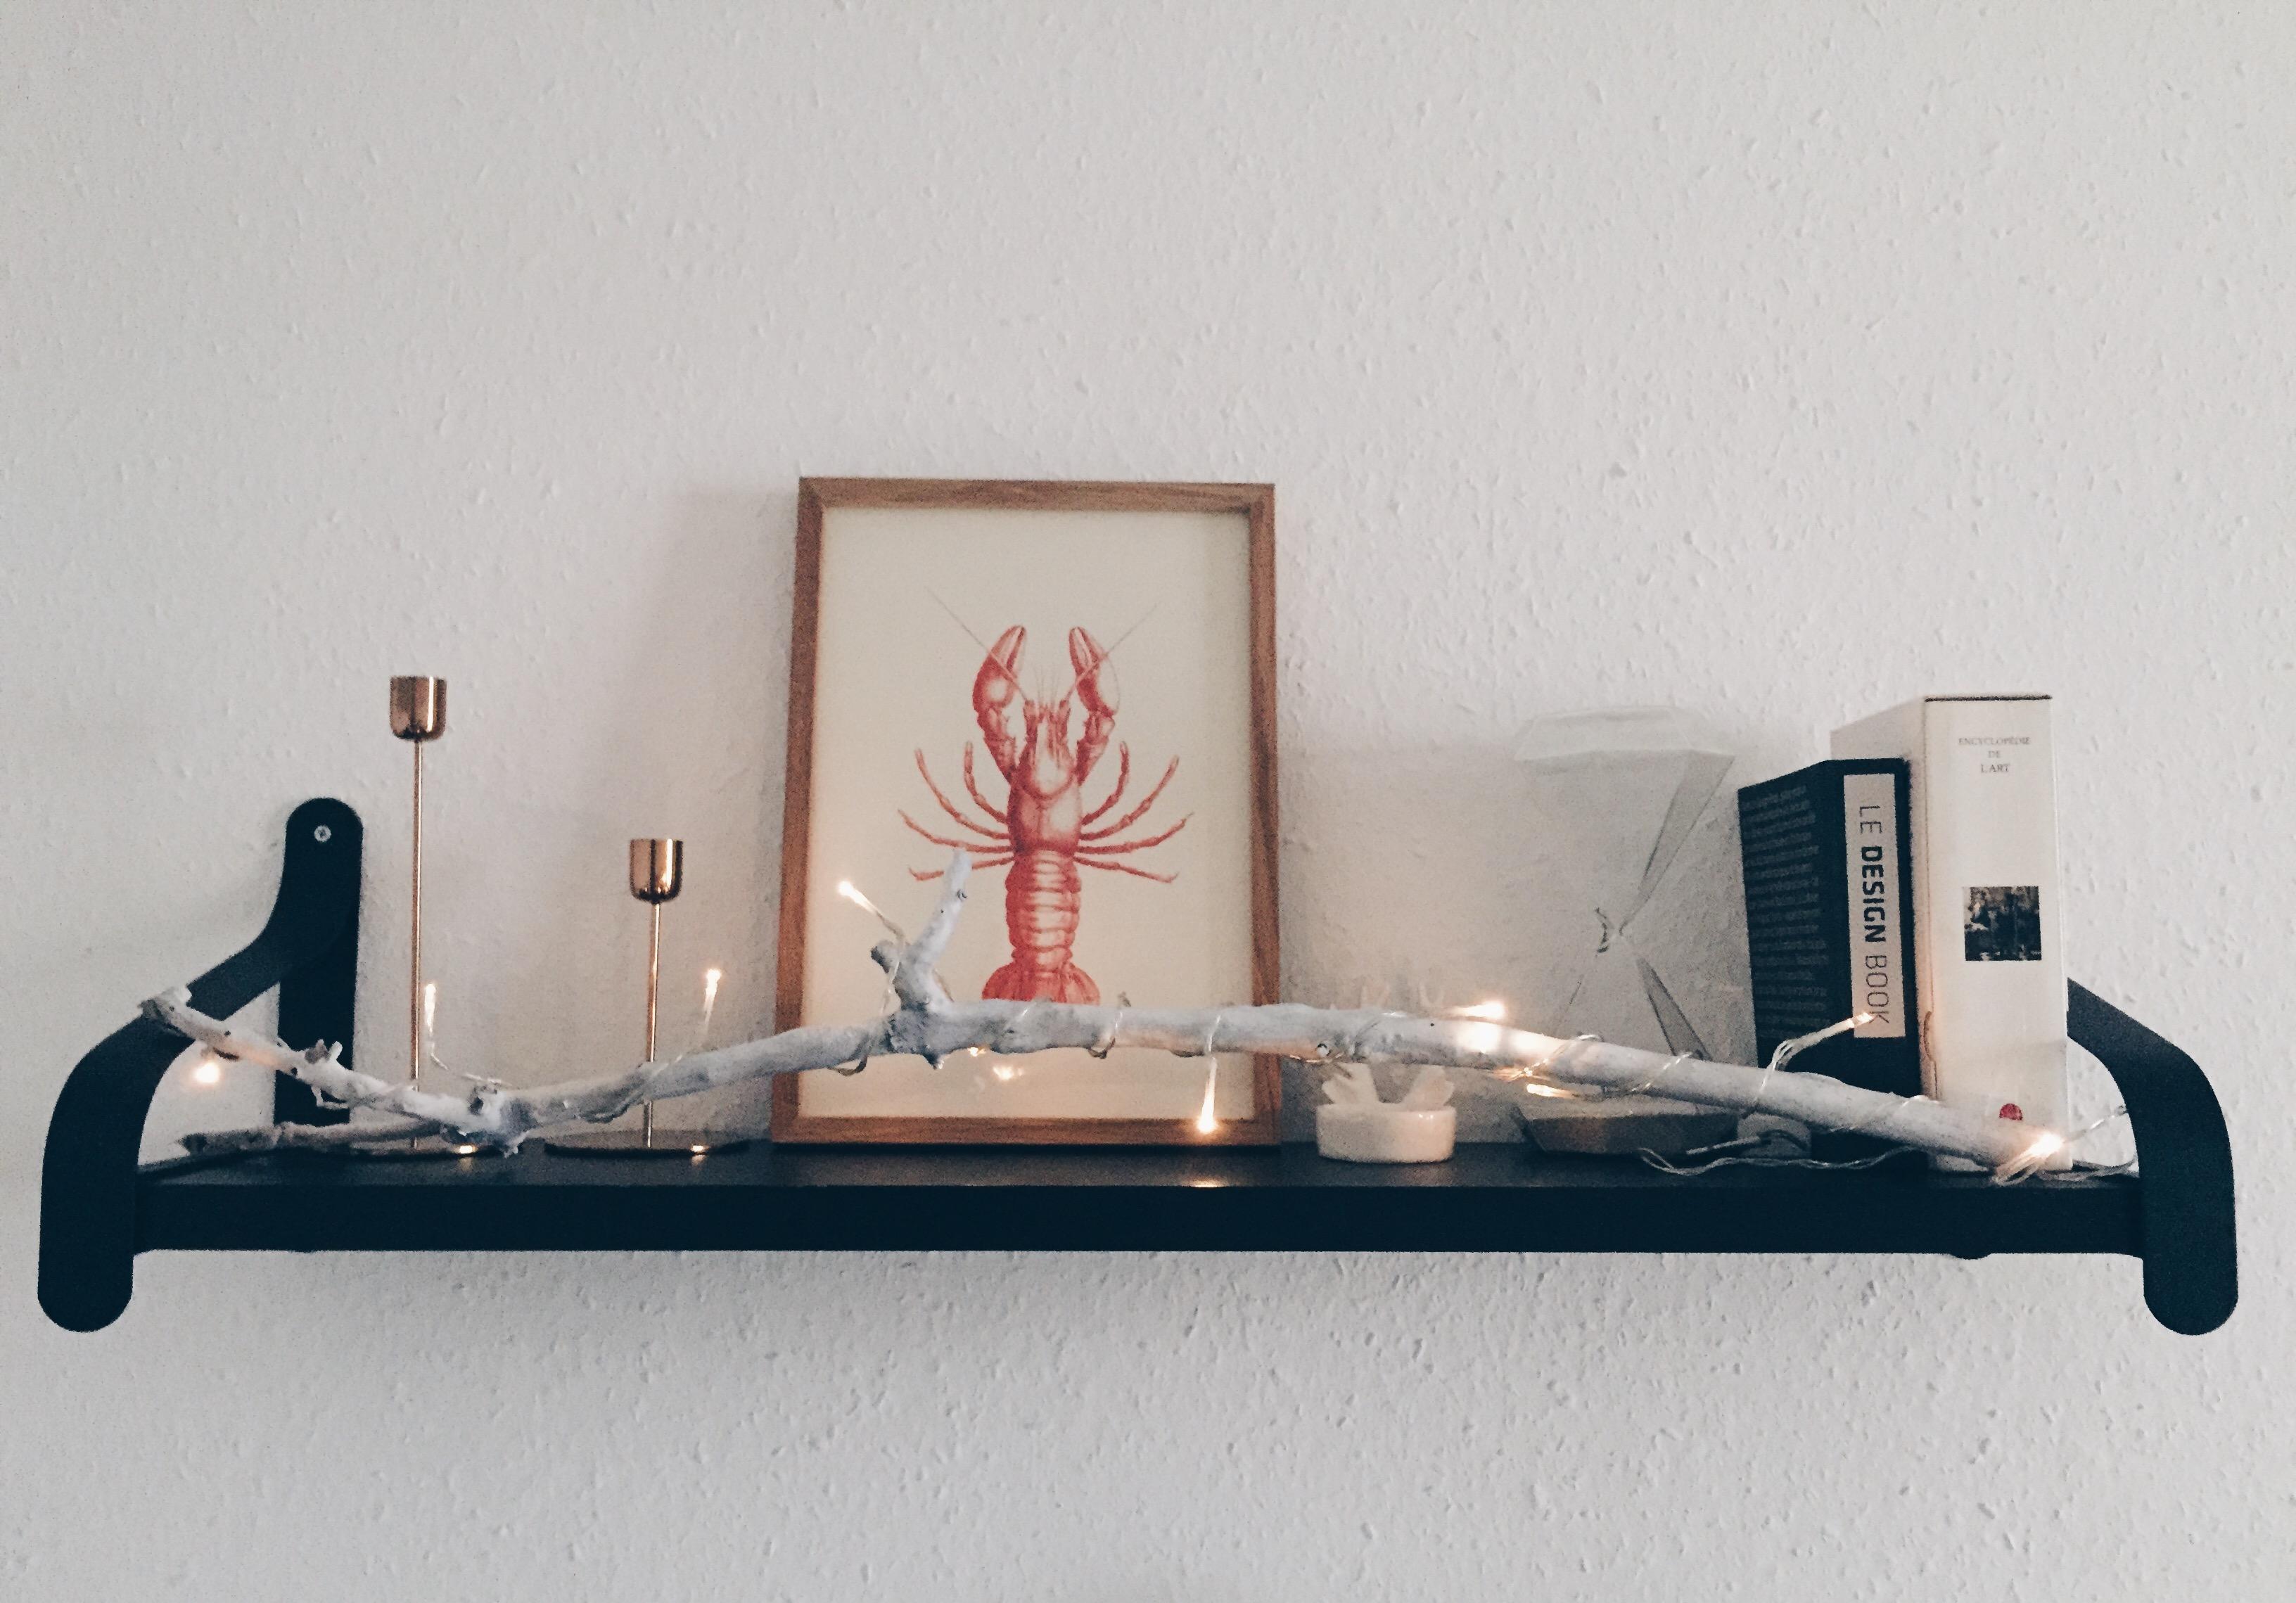 DIY last minute christmas decor ideas - the illuminated branch